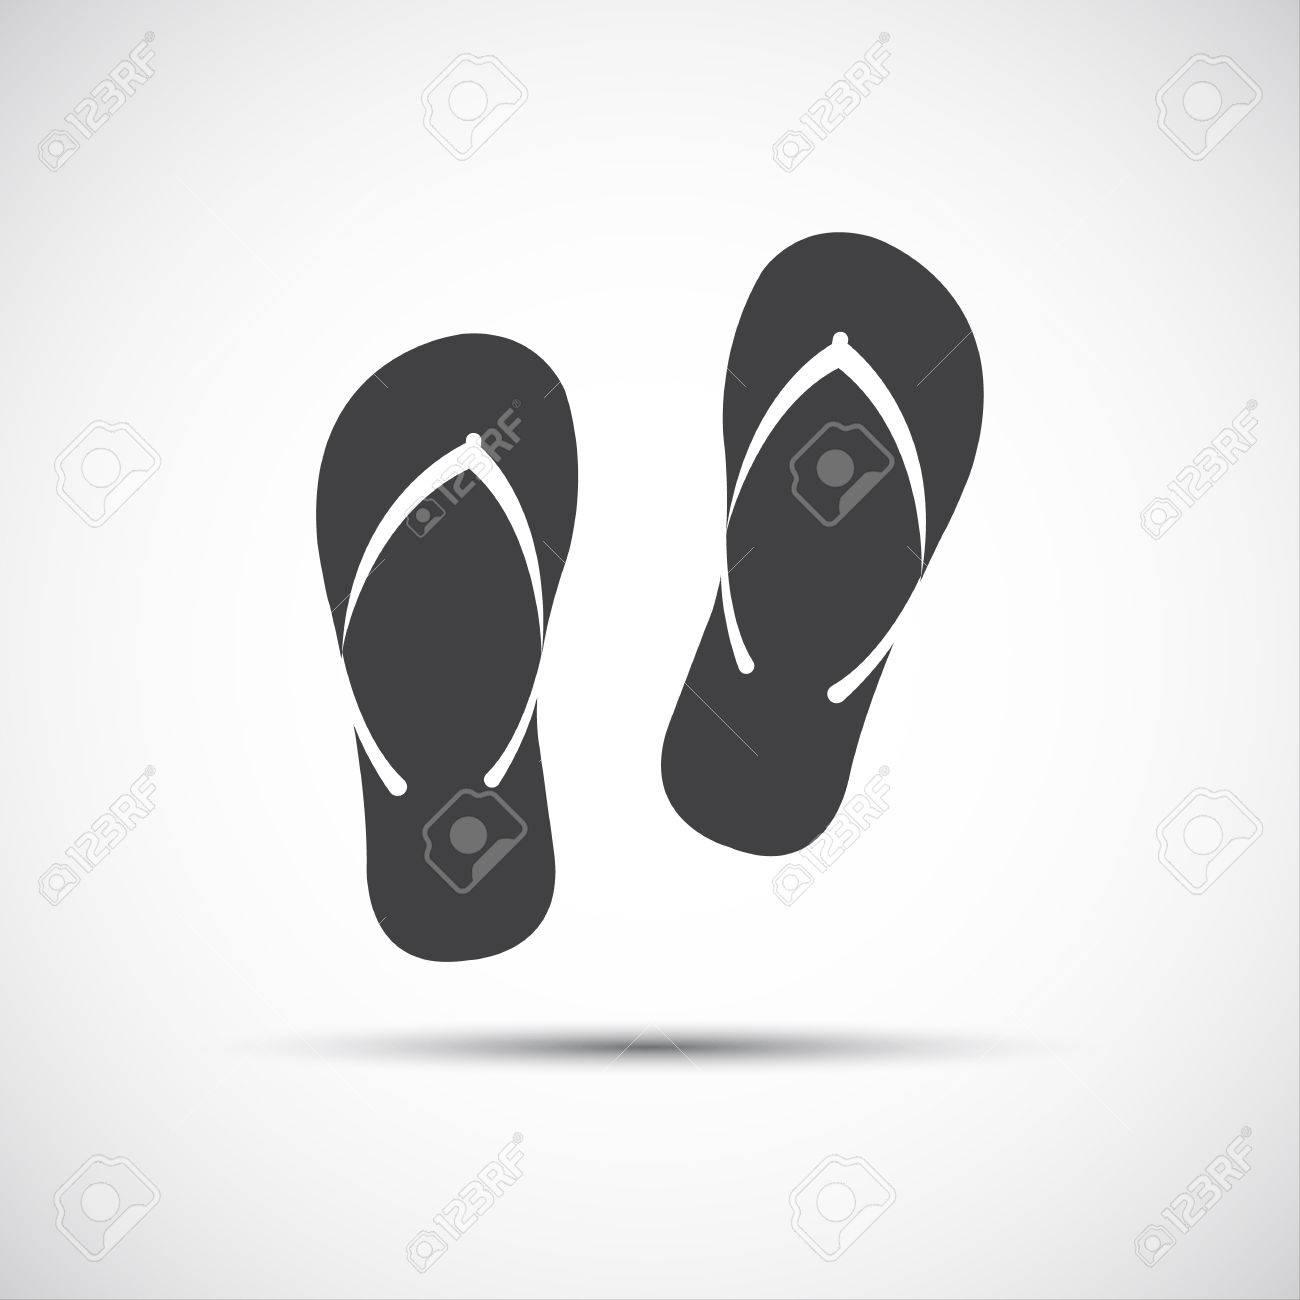 d6d51e0e4922f Simple Beach Flip Flops Icons